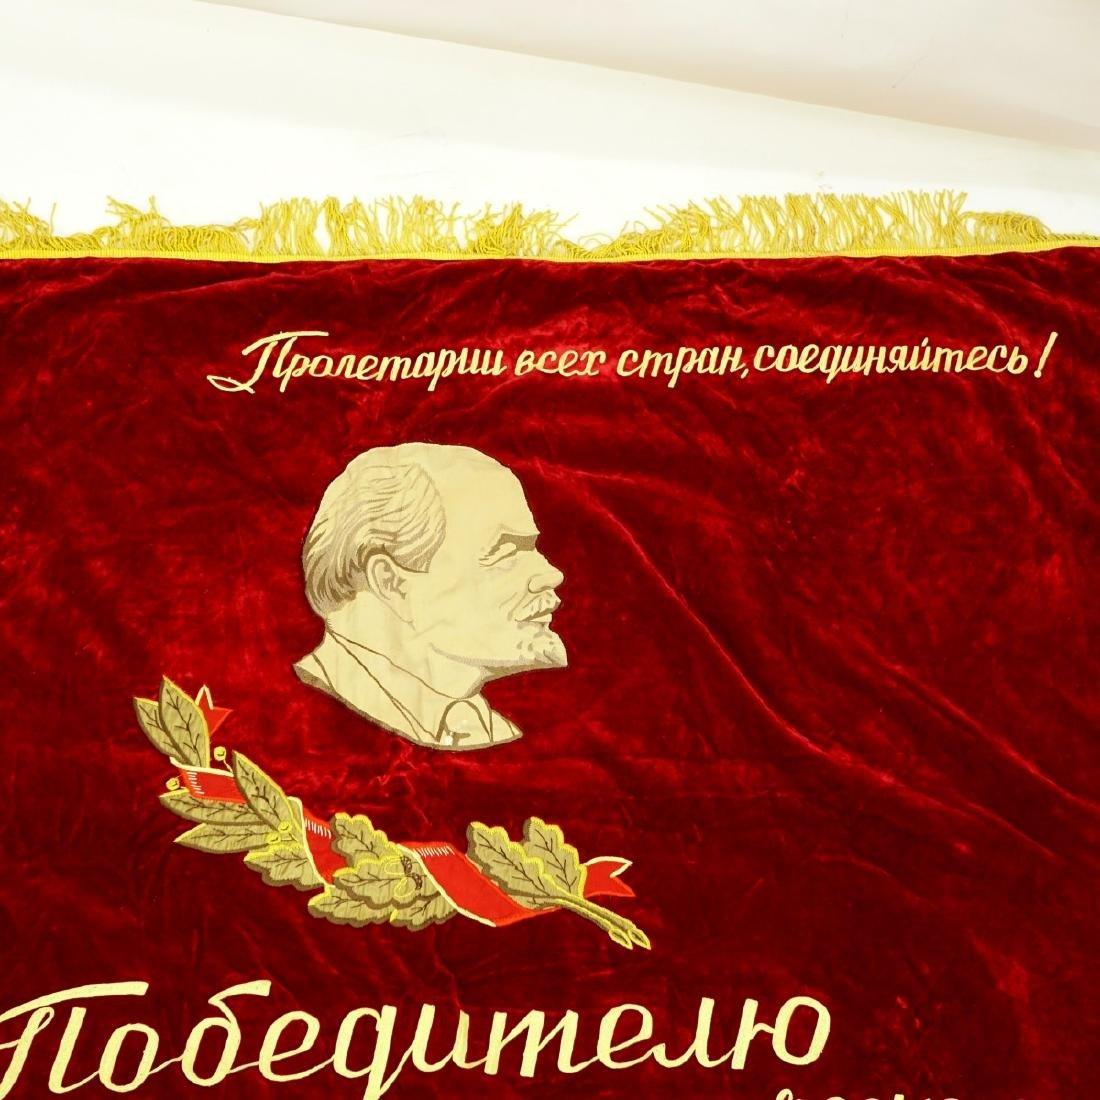 20th Century Russian Soviet Era Lenin-CCCP - 3